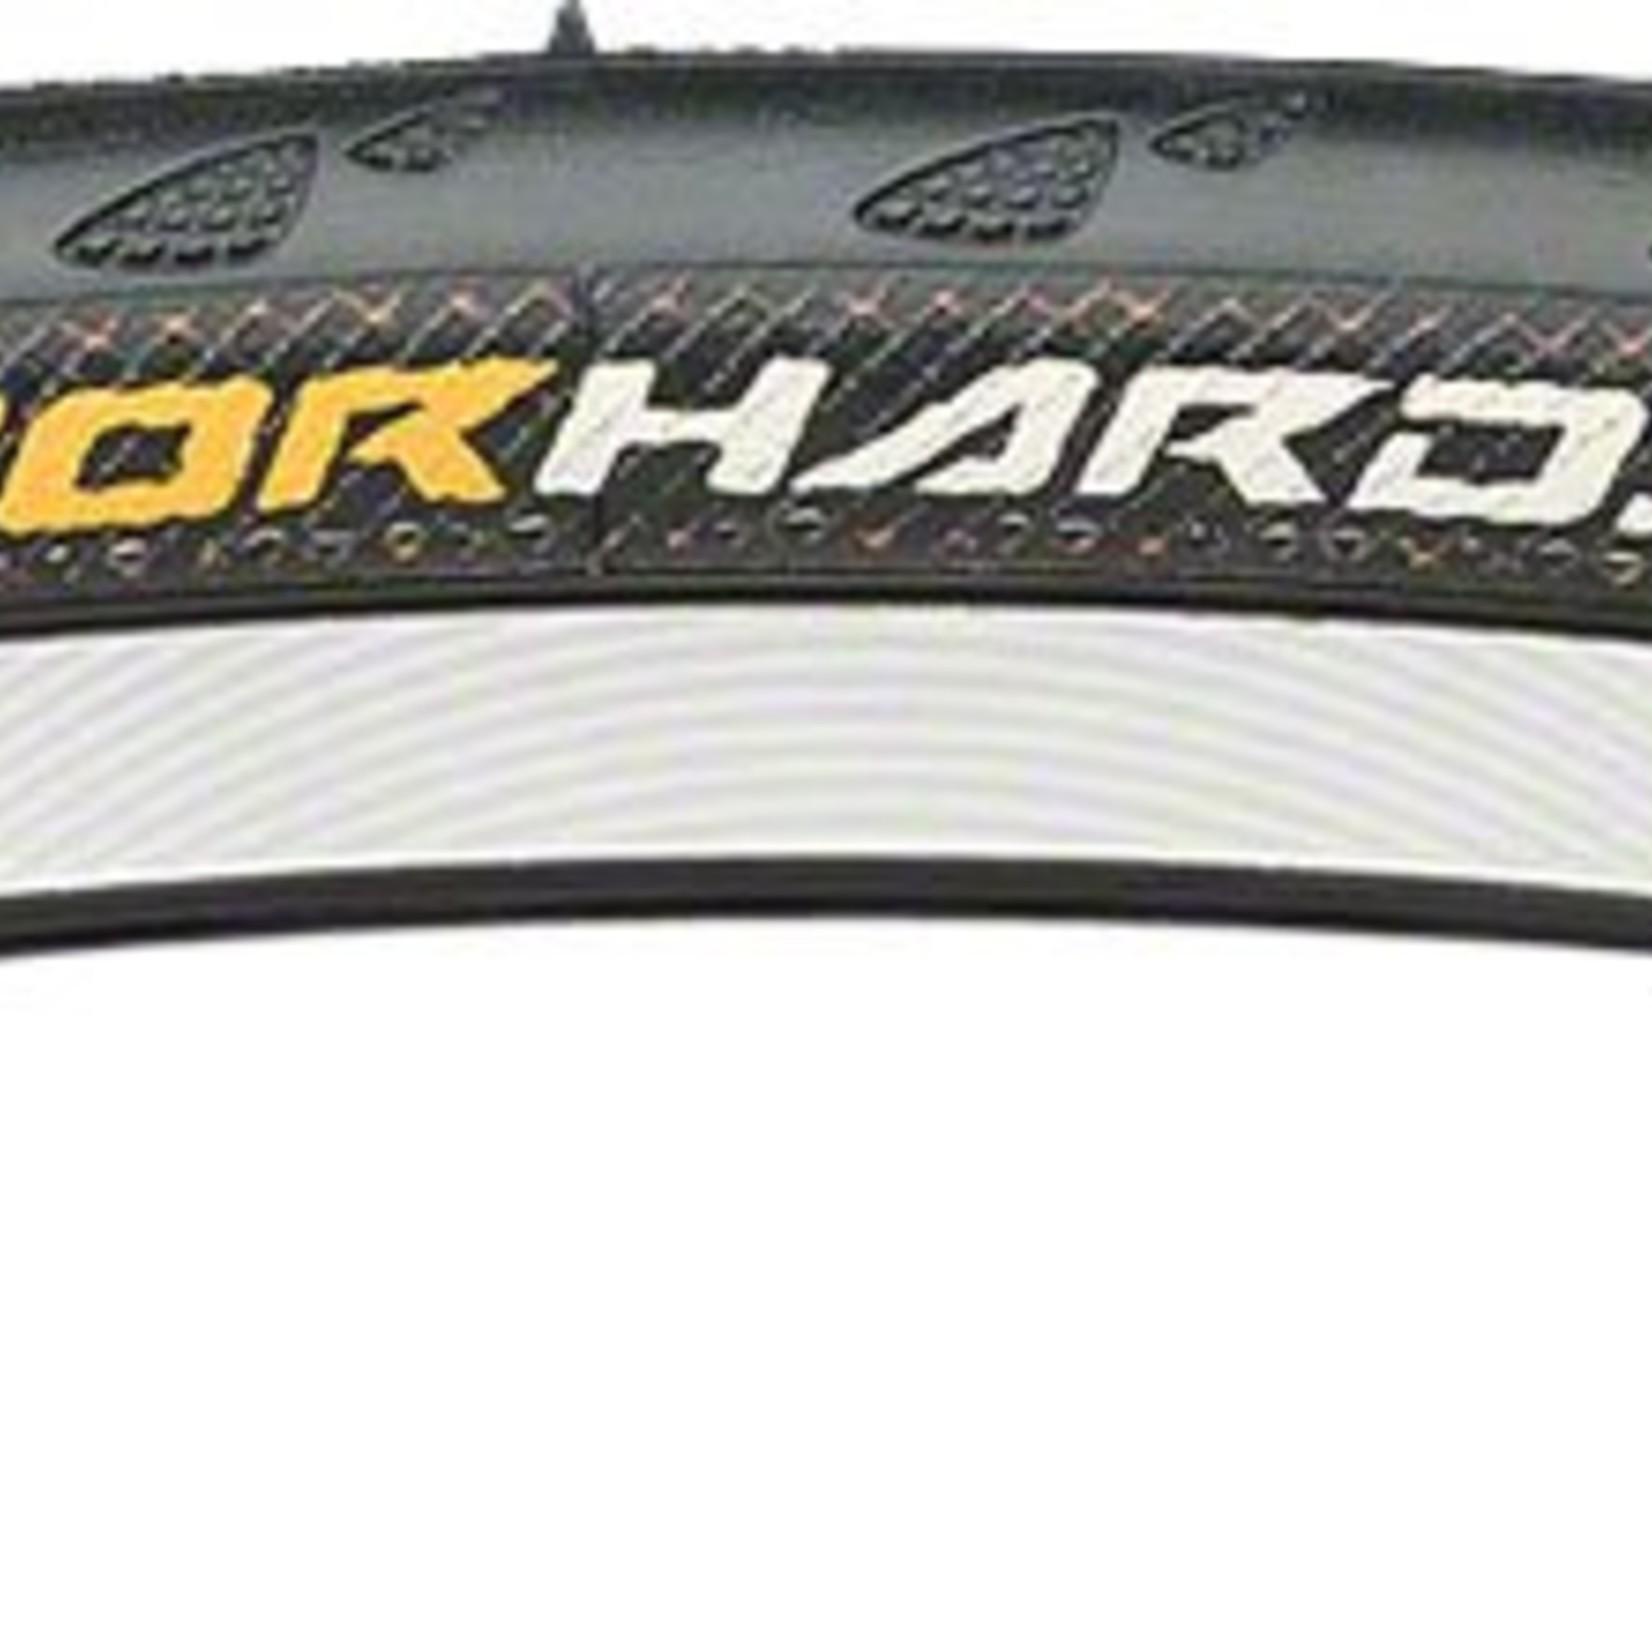 Gator Hardshell Tire 700x25 Folding Bead